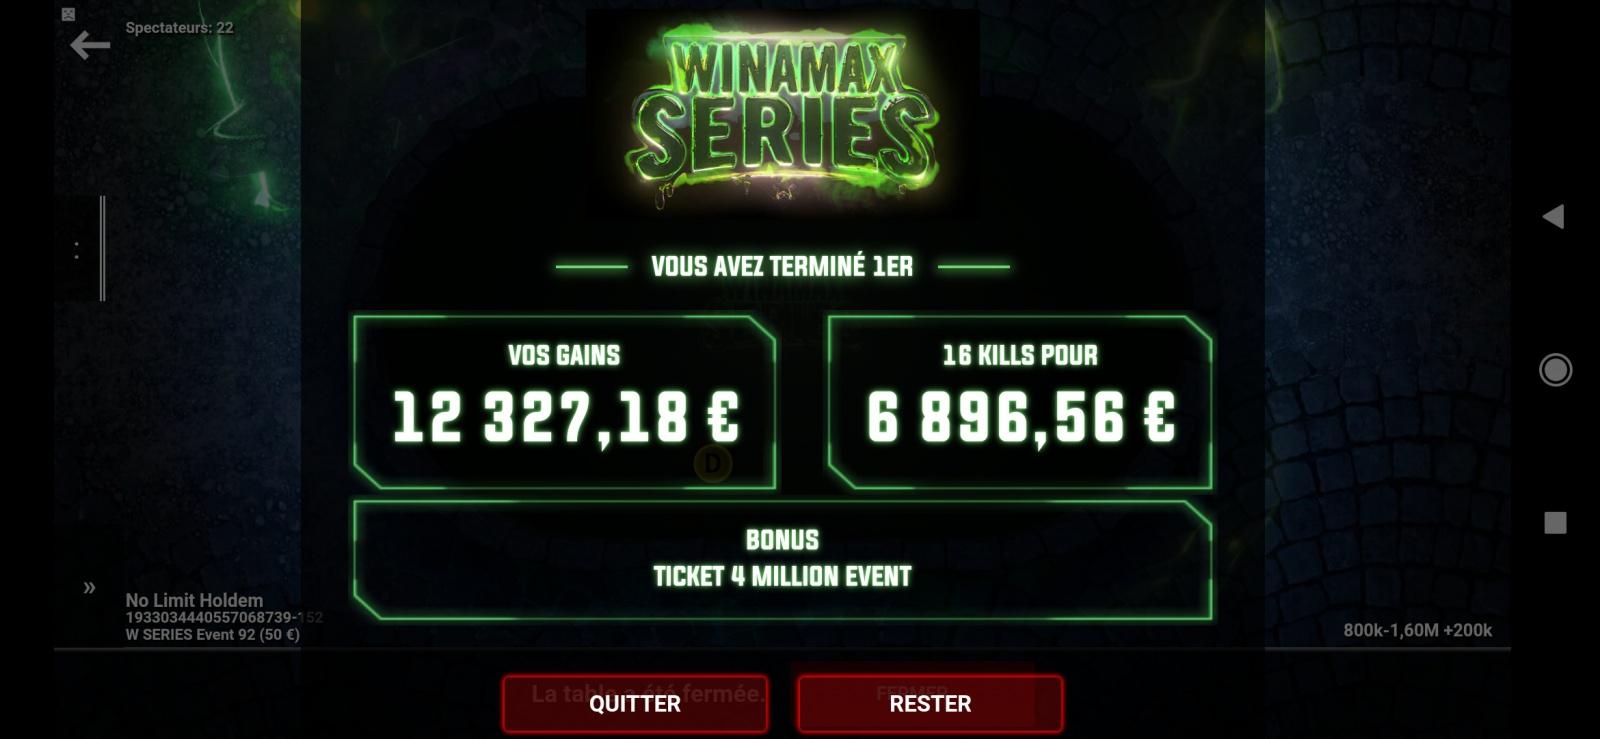 Screenshot_2021-04-10-04-15-53-095_com.winamax.winajs.thumb.jpg.07e02d2902f0c3974e0e4c03d3a7cde4.jpg